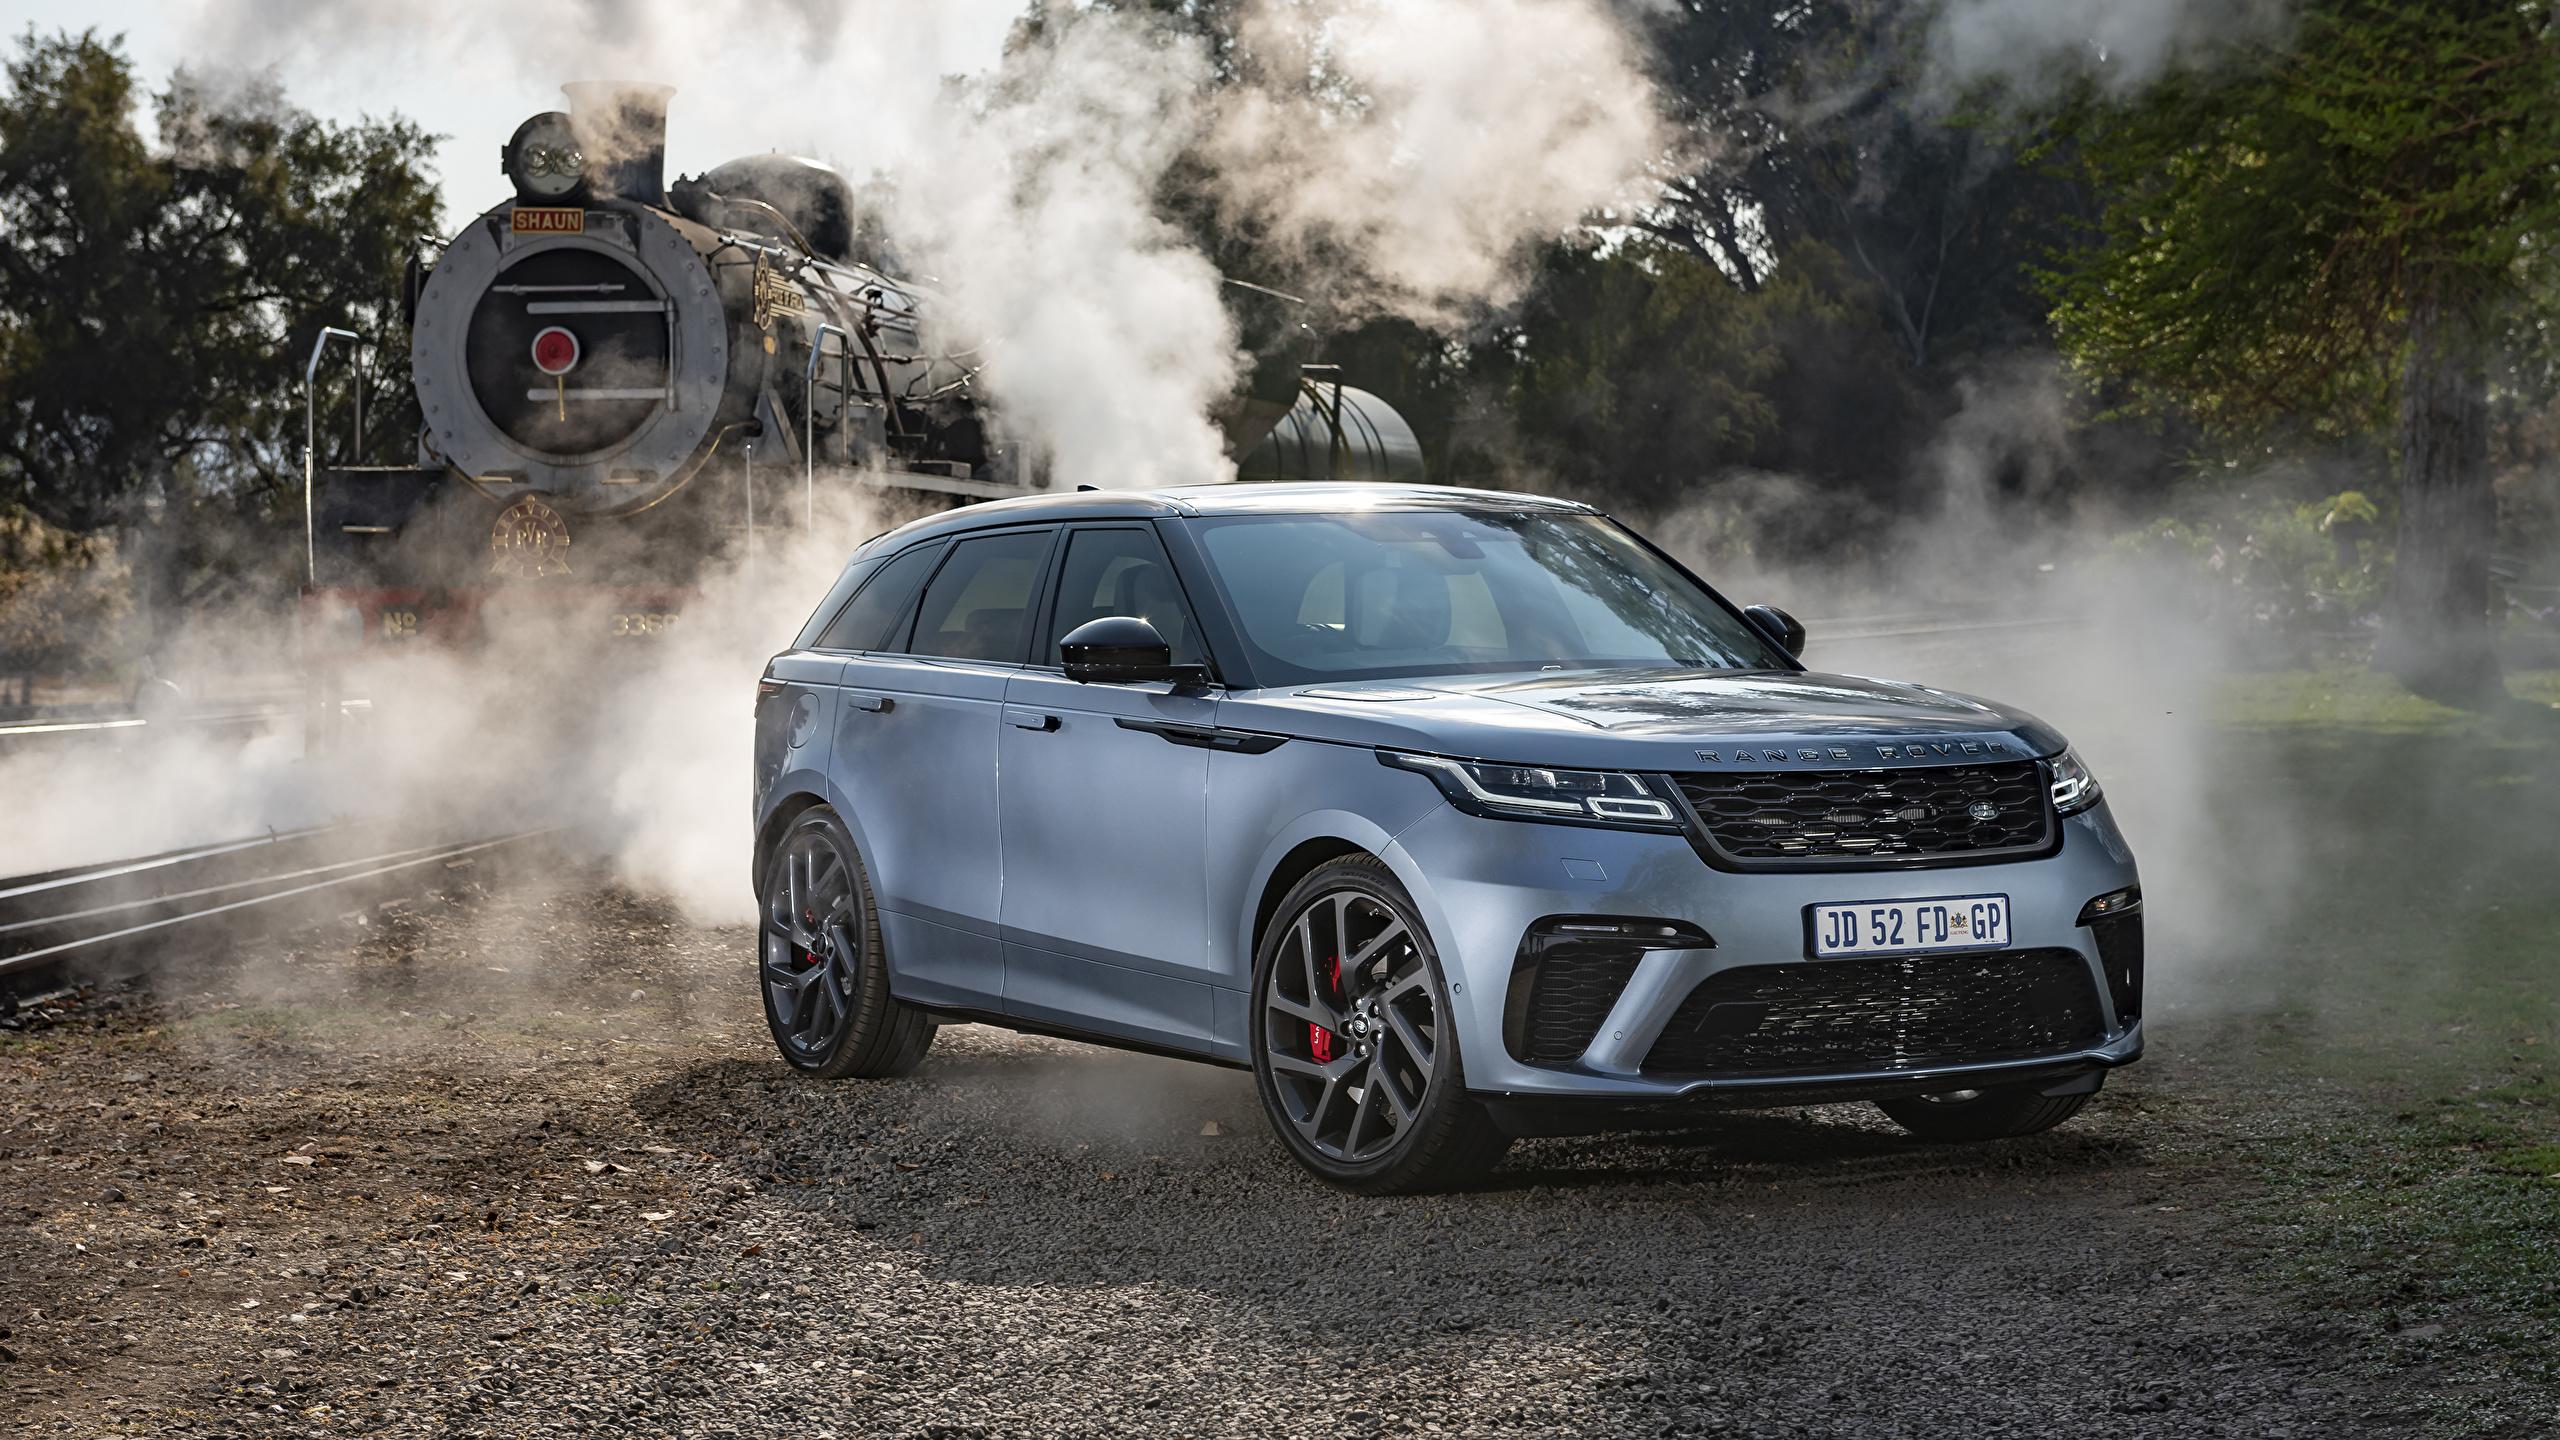 Fotos Land Rover Crossover 2019-20 Velar SVAutobiography Dynamic Edition Grau Autos 2560x1440 Softroader graue graues auto automobil